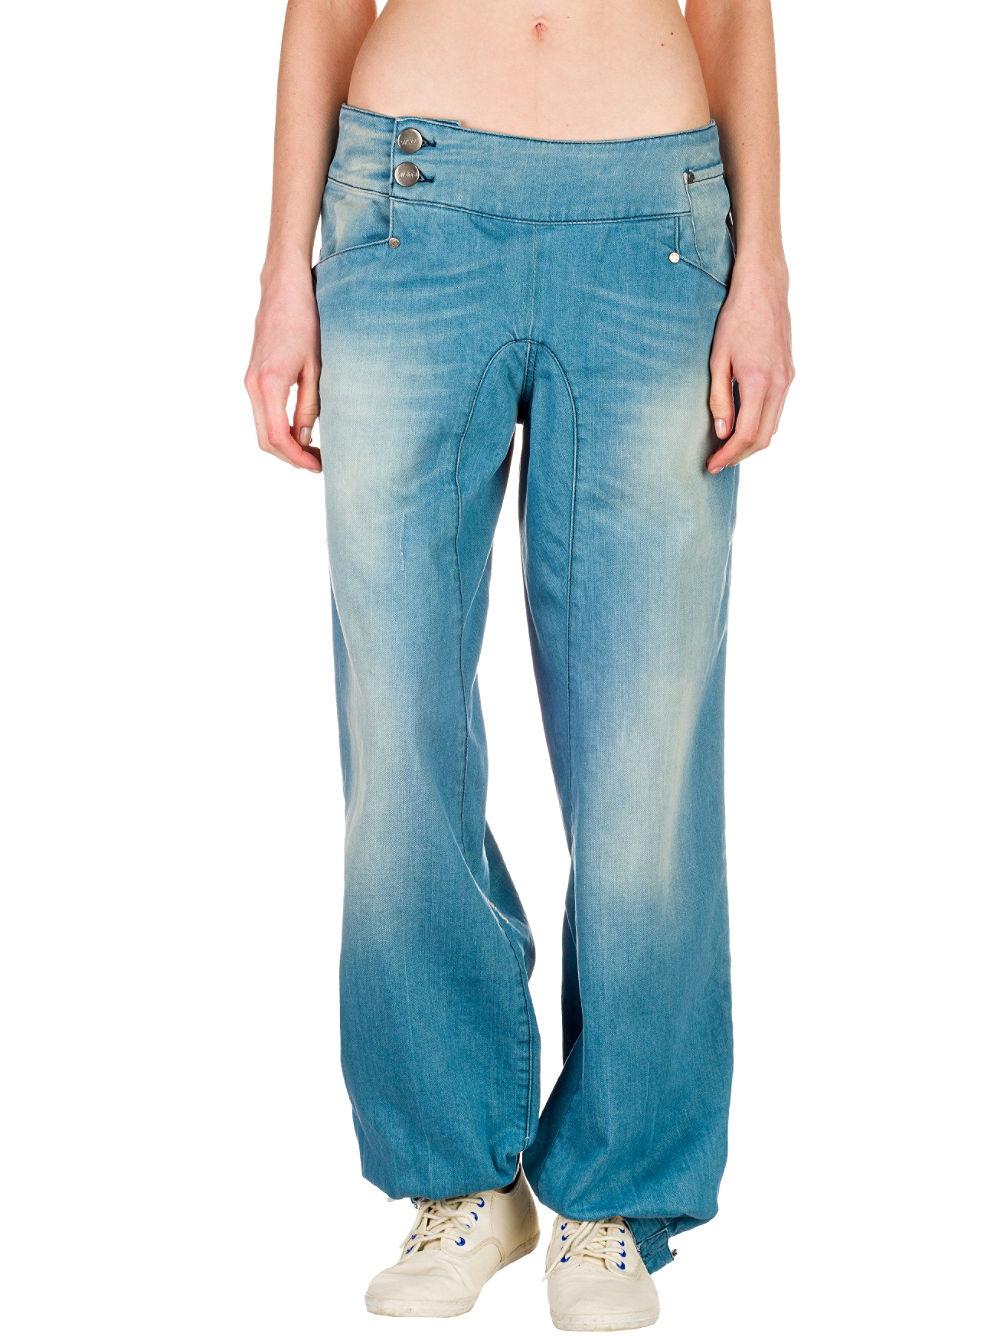 nikita-reality-jeans